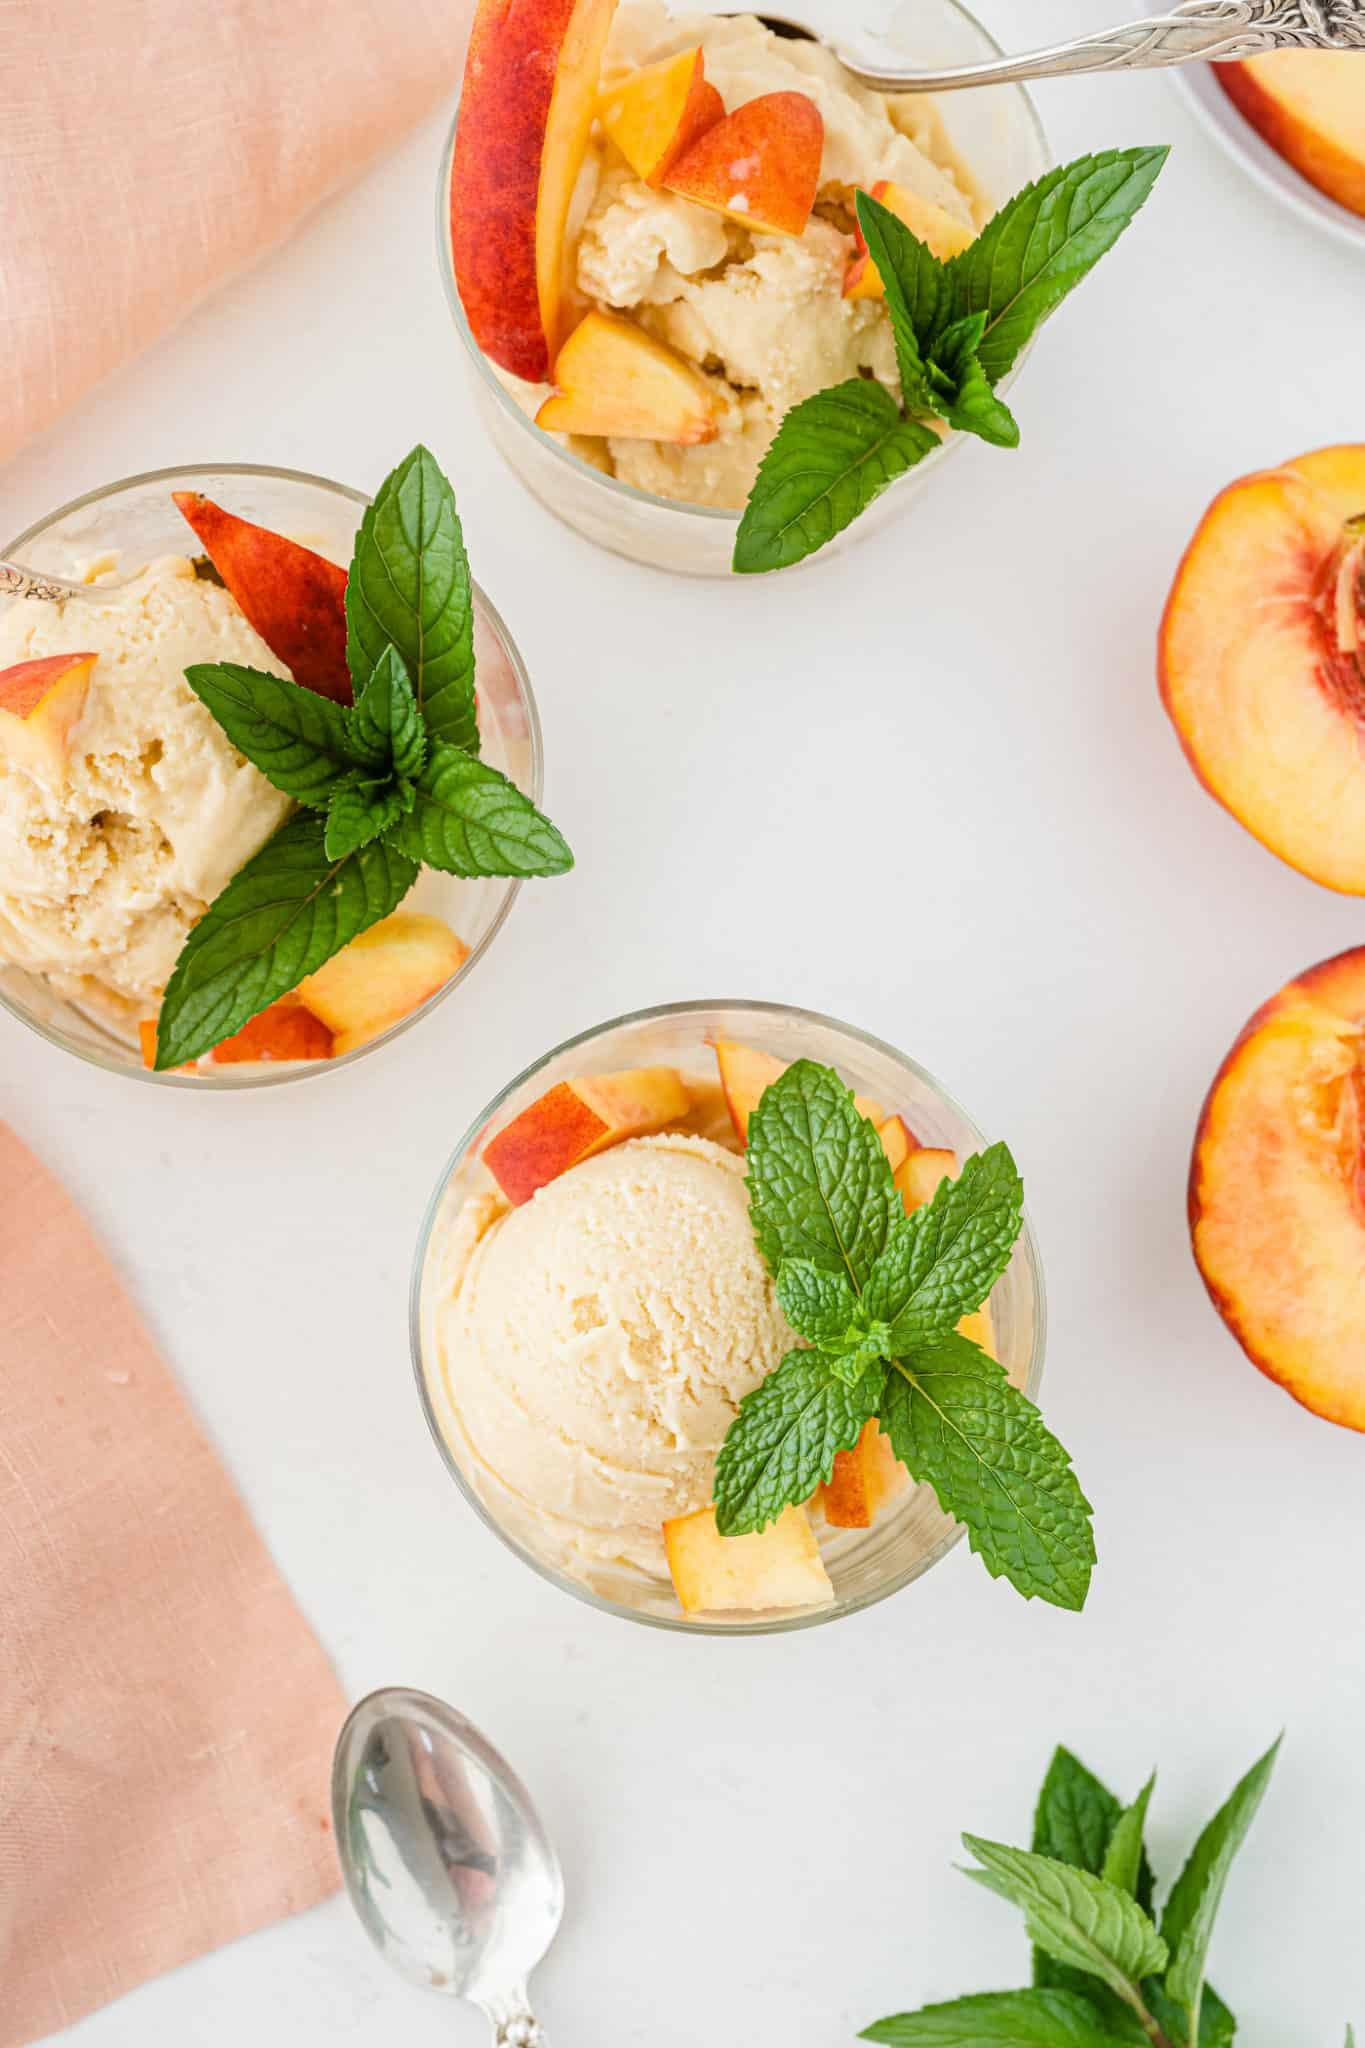 three bowls of peach ice cream on a table